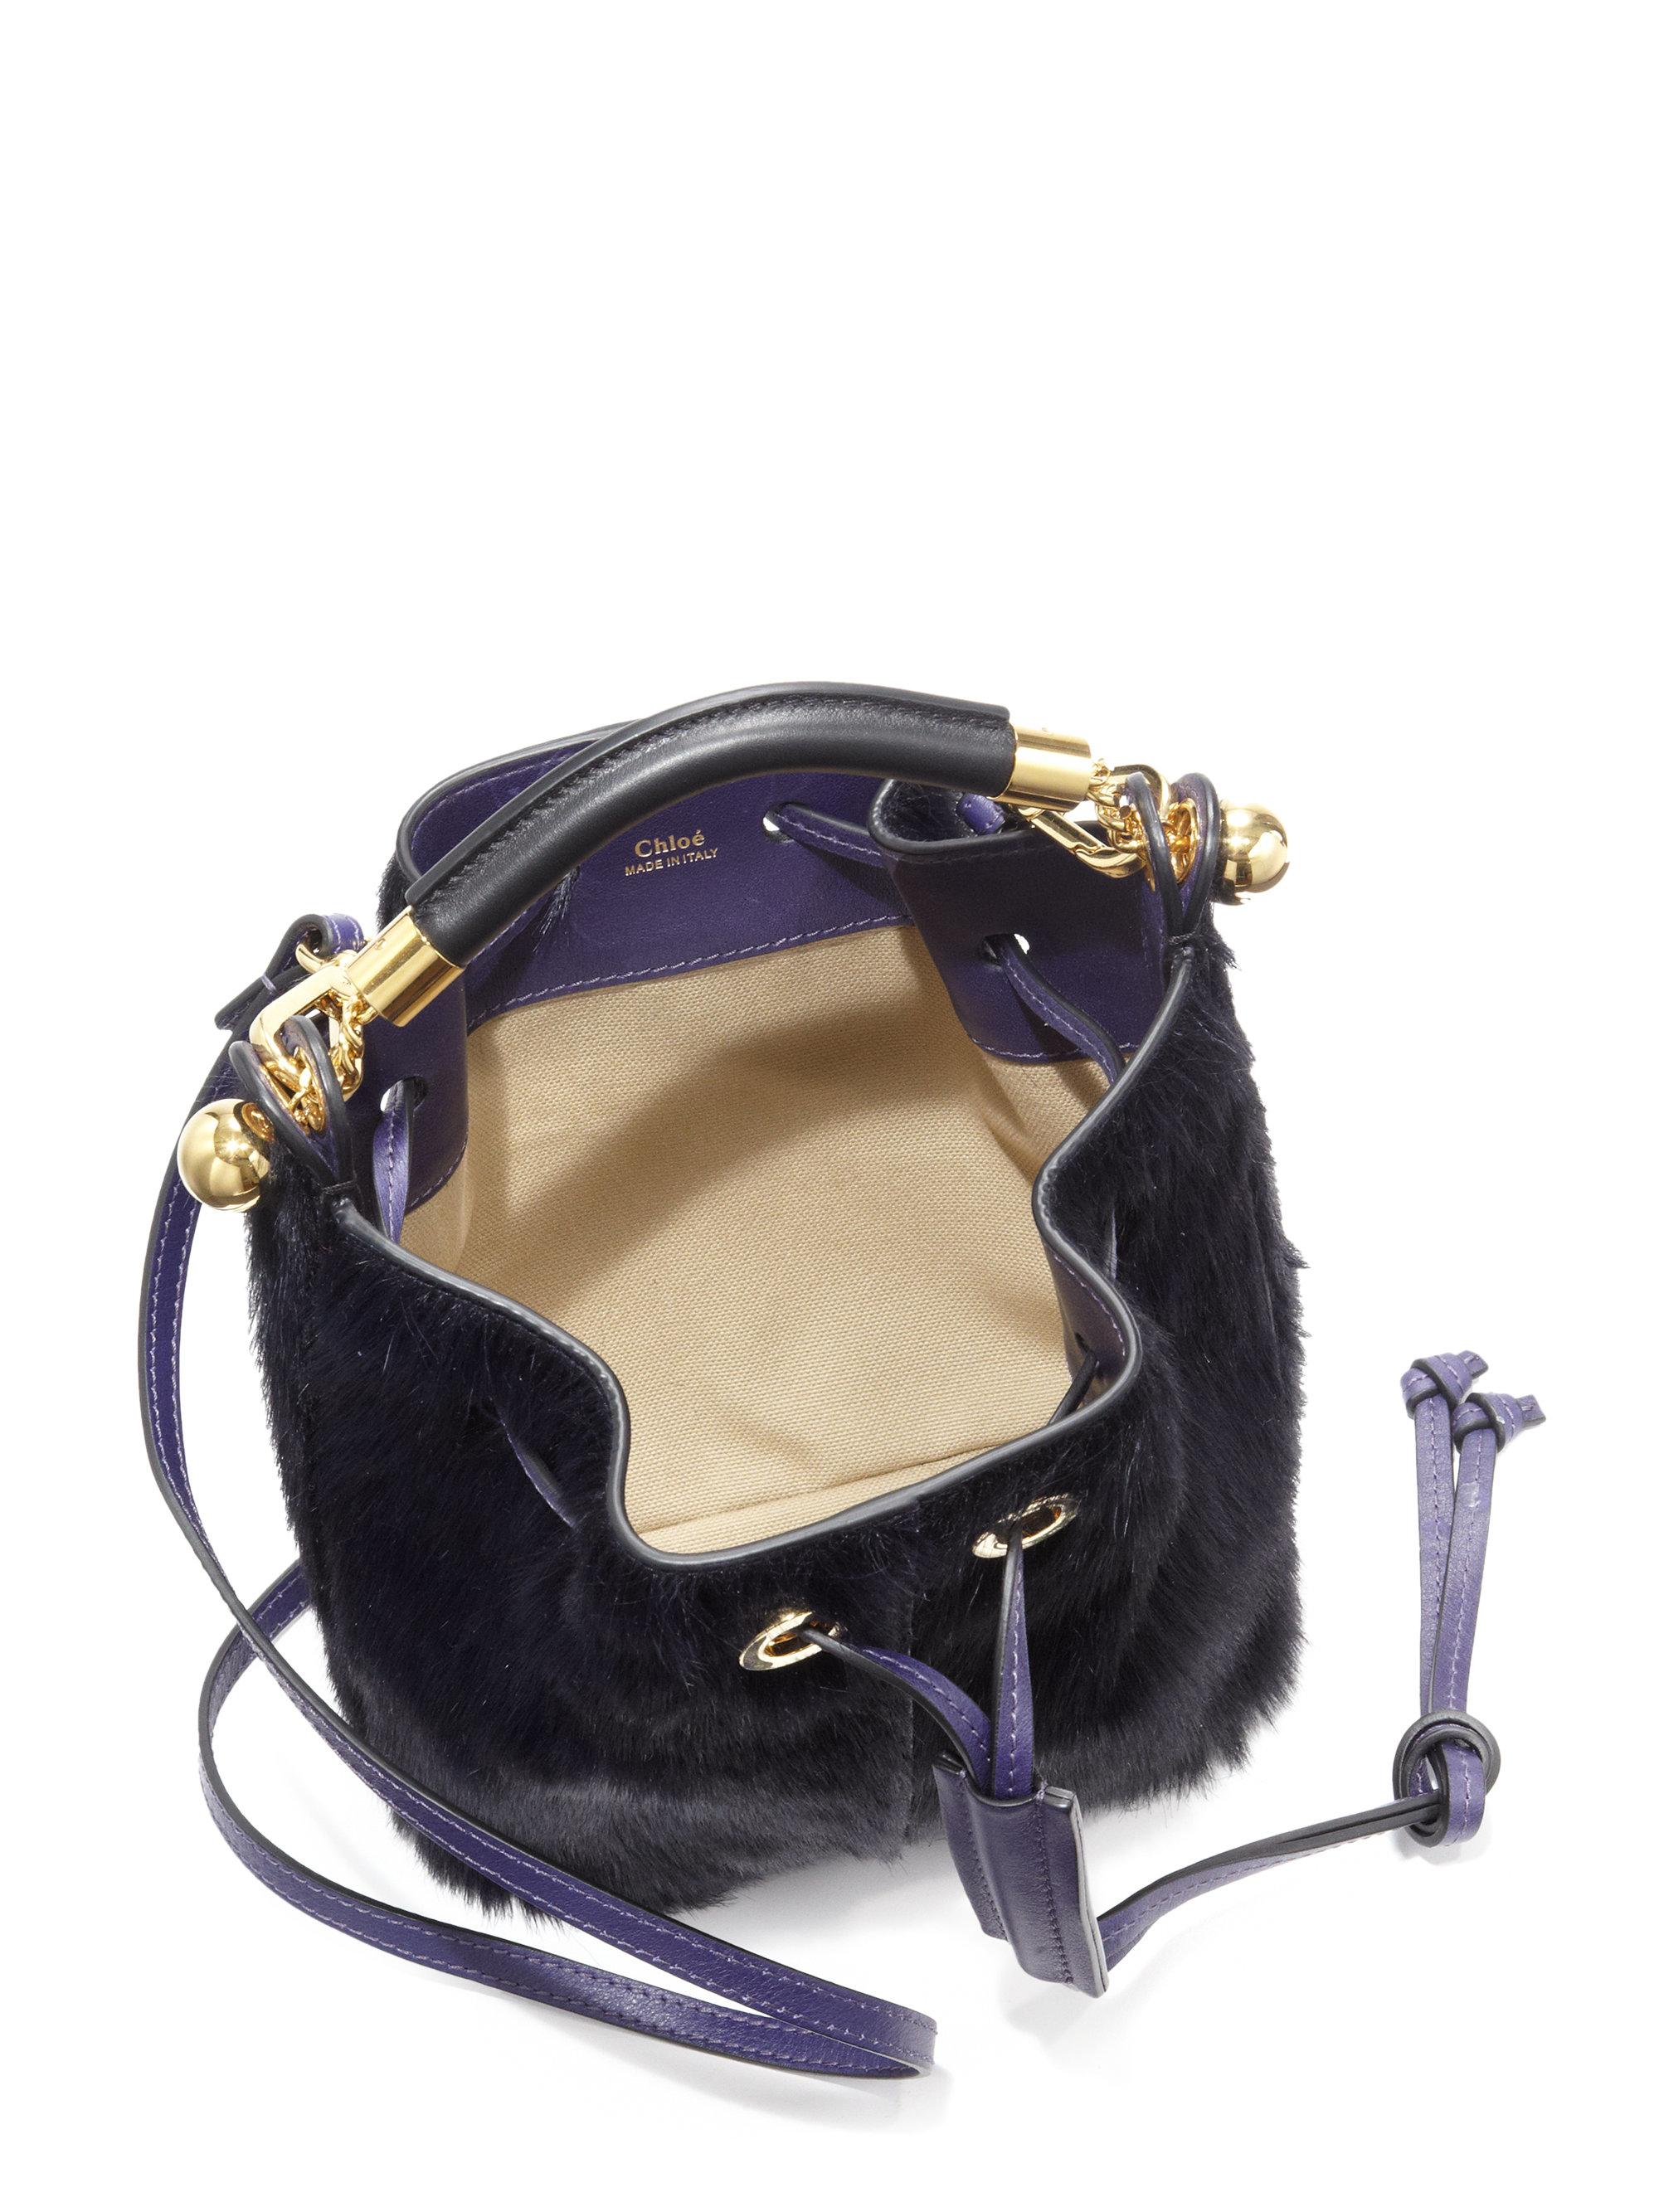 buy chloe bags online - chloe calfskin small marcie round crossbody dark velvet